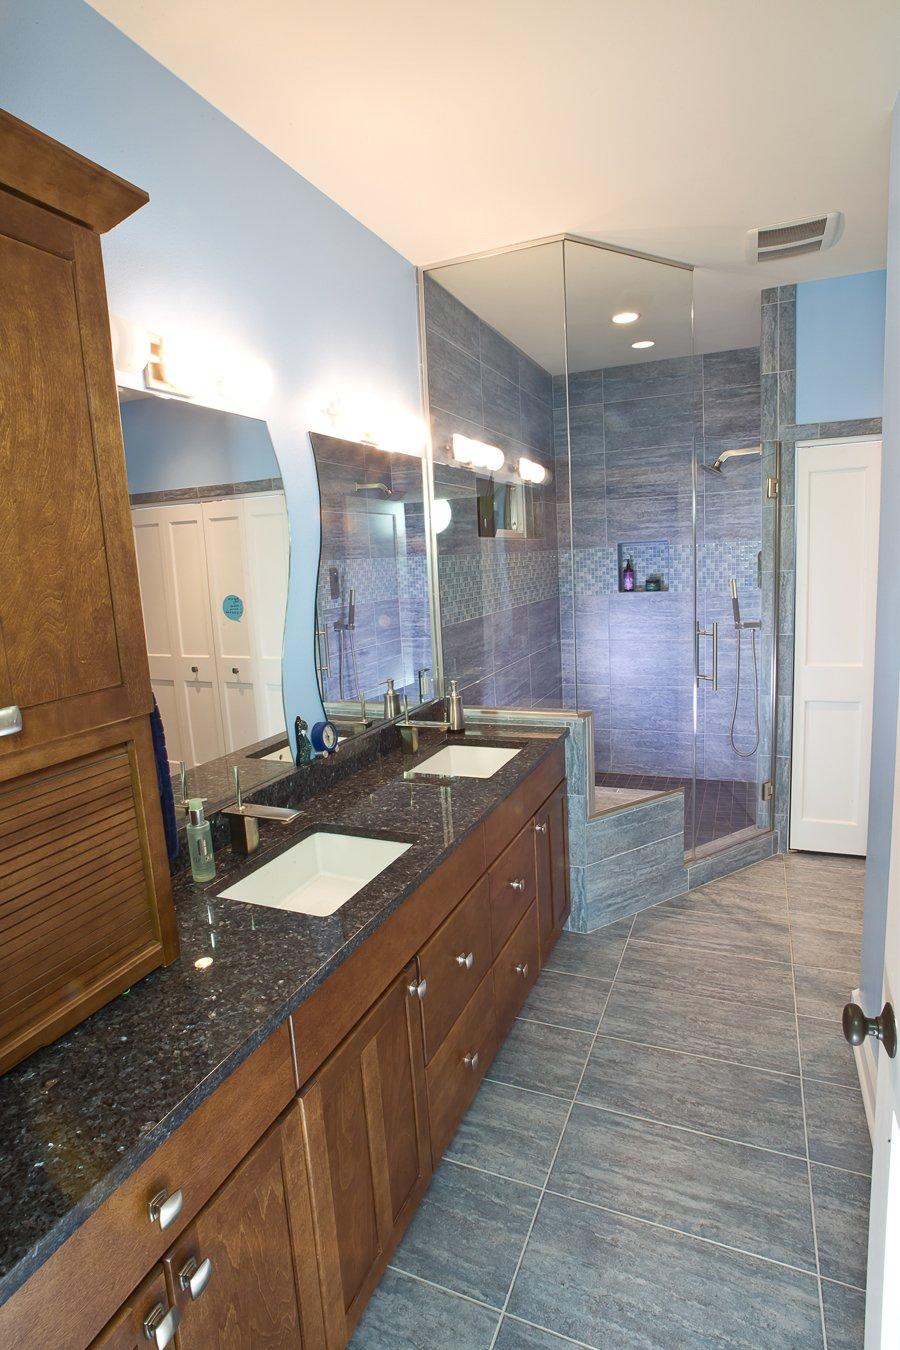 Bathroom Design, blue bathroom tile, corner shower, large corner shower, frameless shower glass surround, double sink vanity, storage vanity tower, dark granite countertop